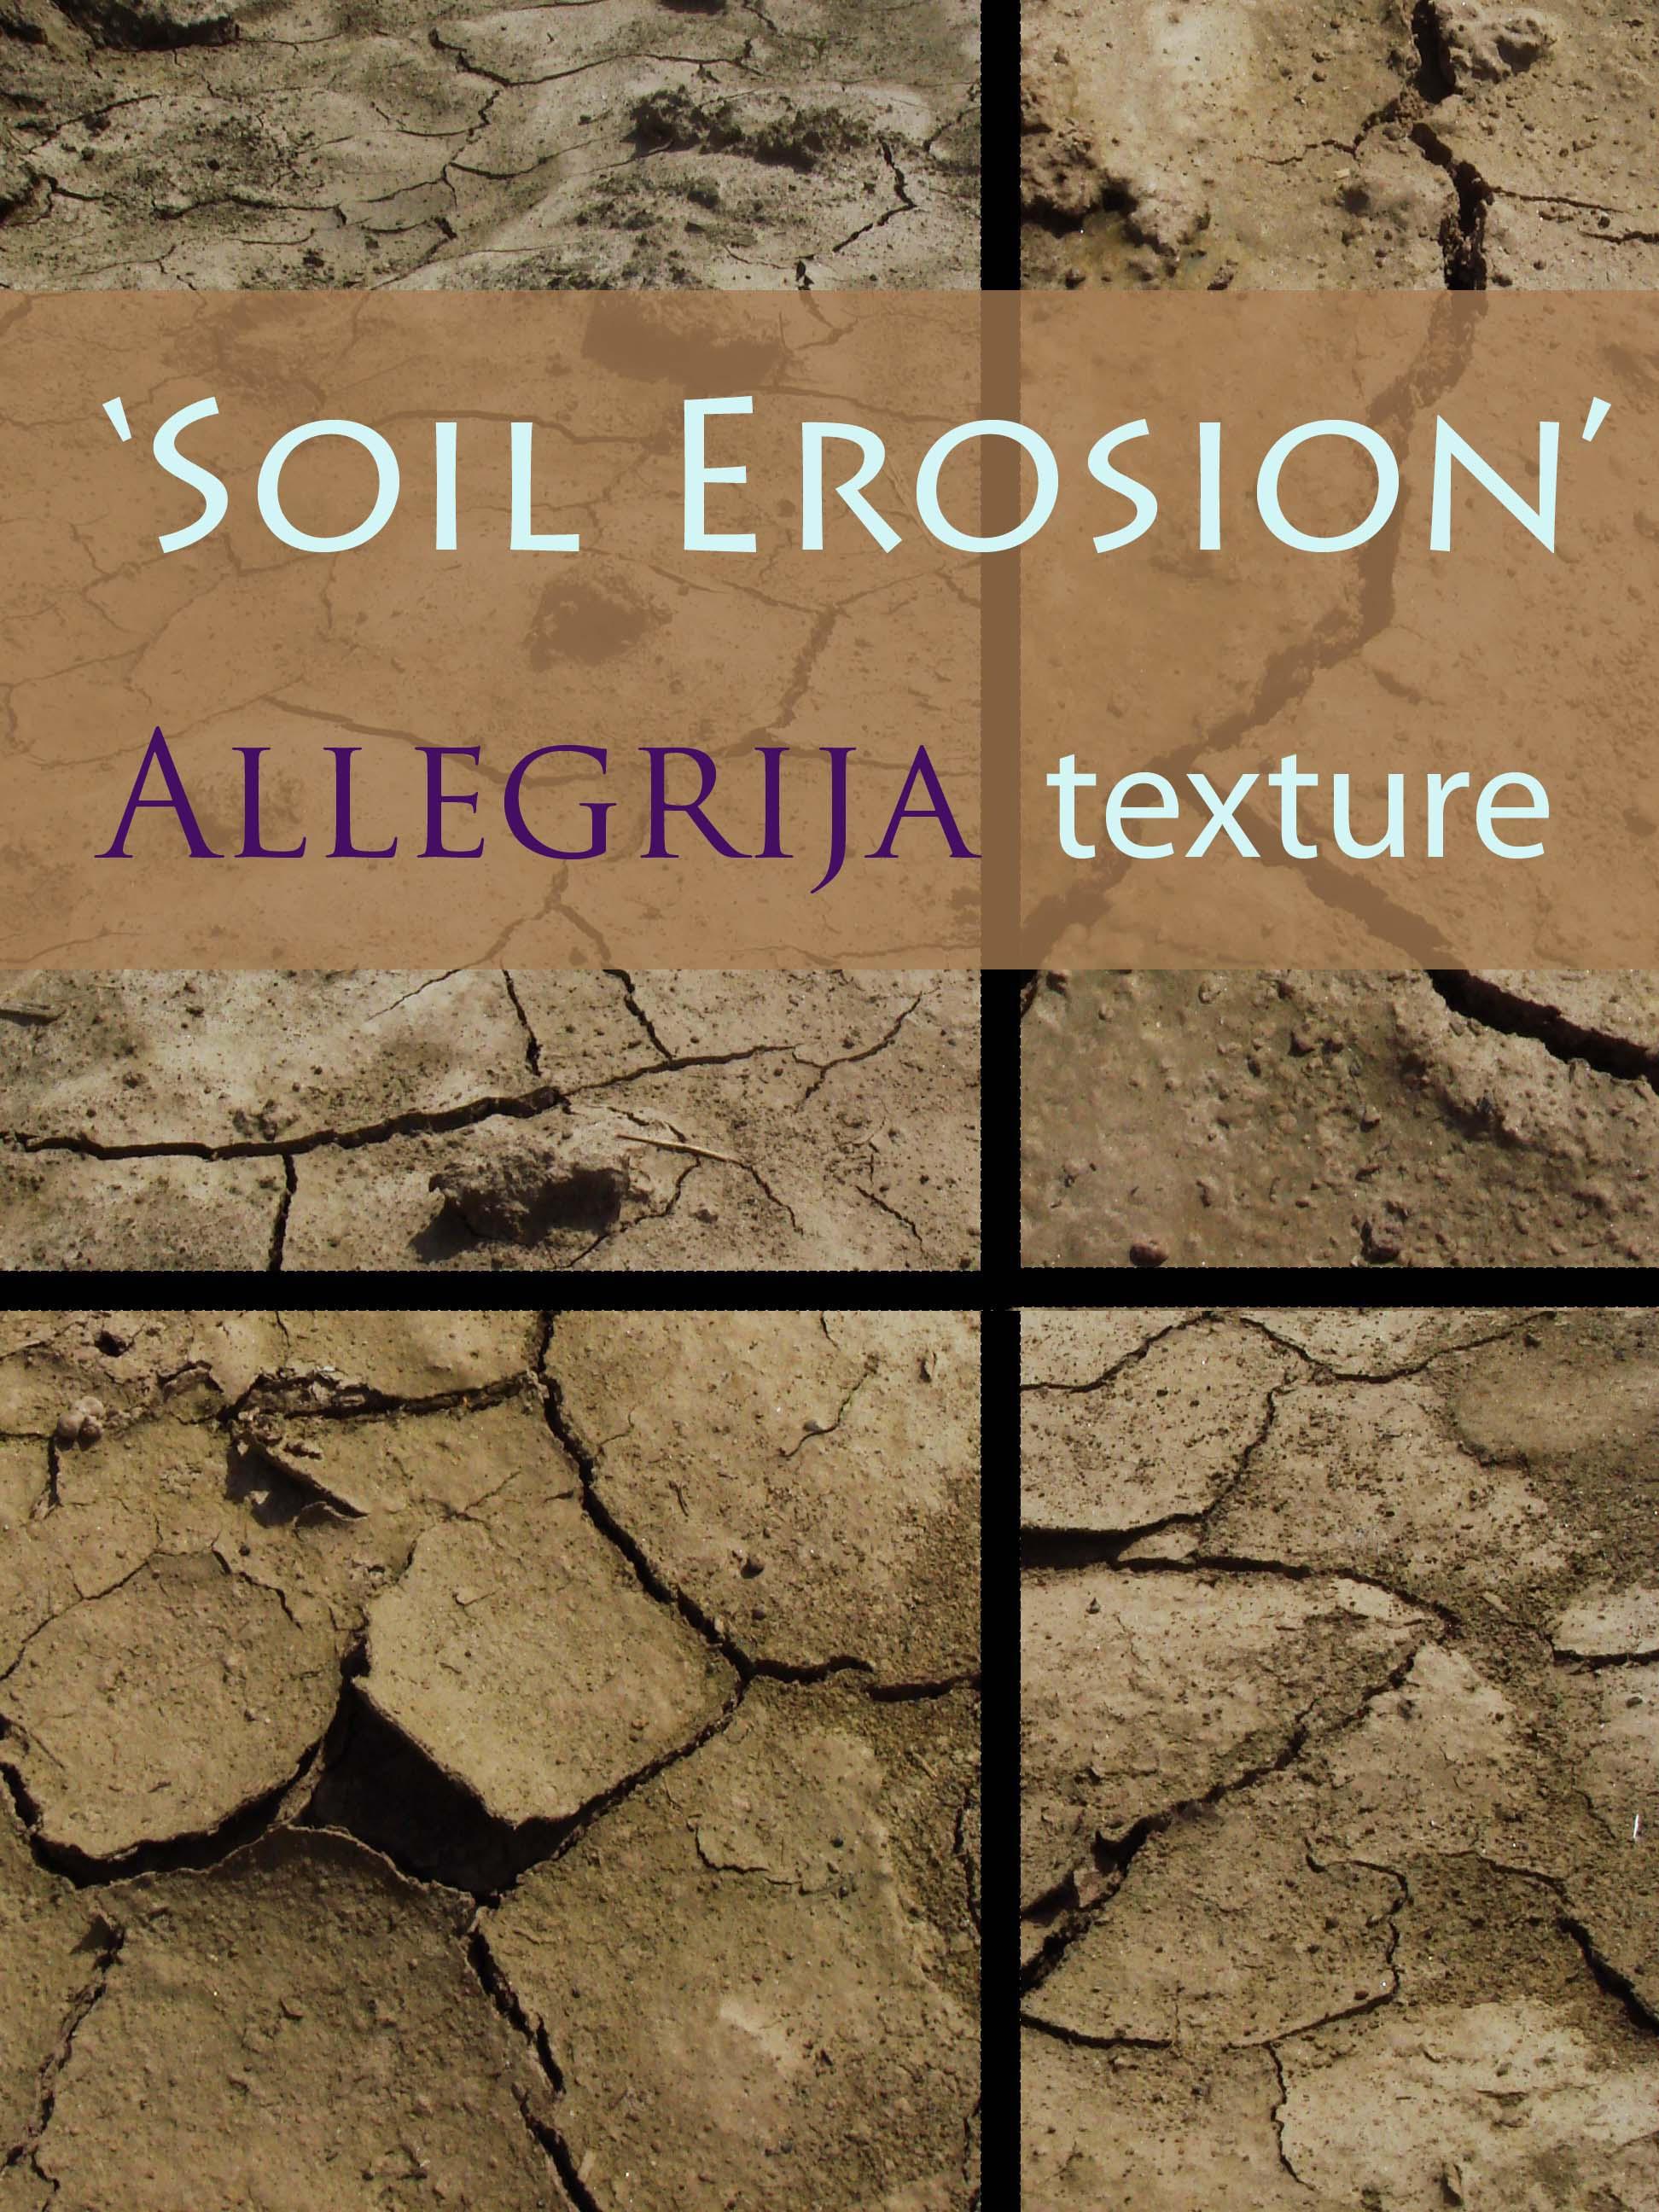 Soil erosion texture by allegrija on deviantart for Soil tour dates 2015